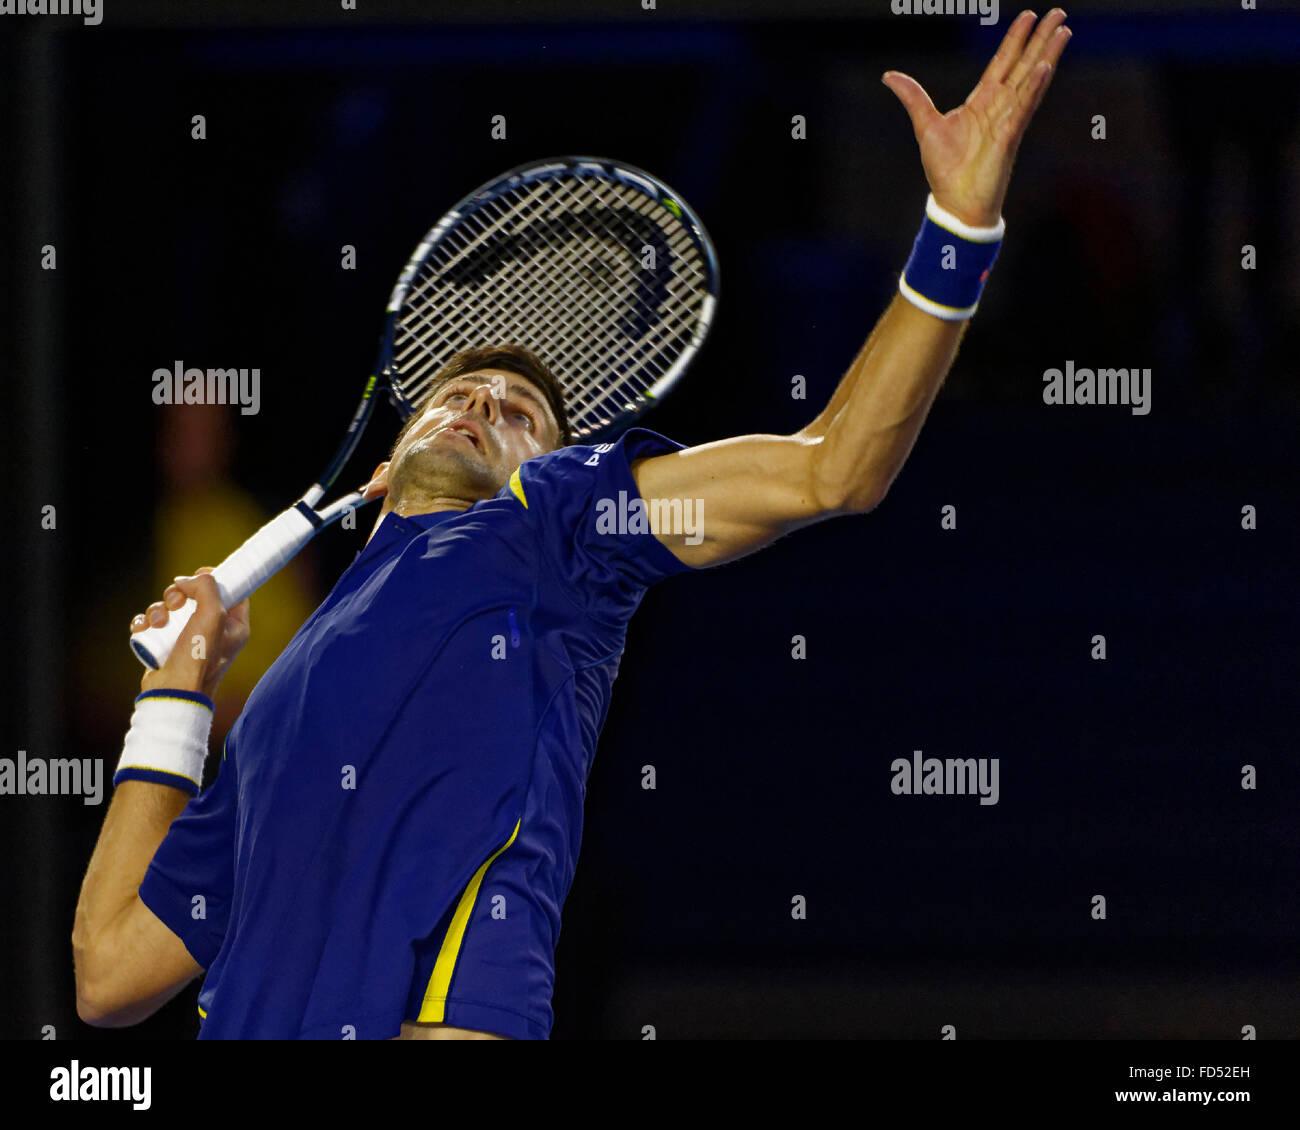 Melbourne, Australien. 28. Januar 2016. Novak Djokovic (SRB) in Aktion gegen Roger Federier (SUI) während ihrer Stockfoto